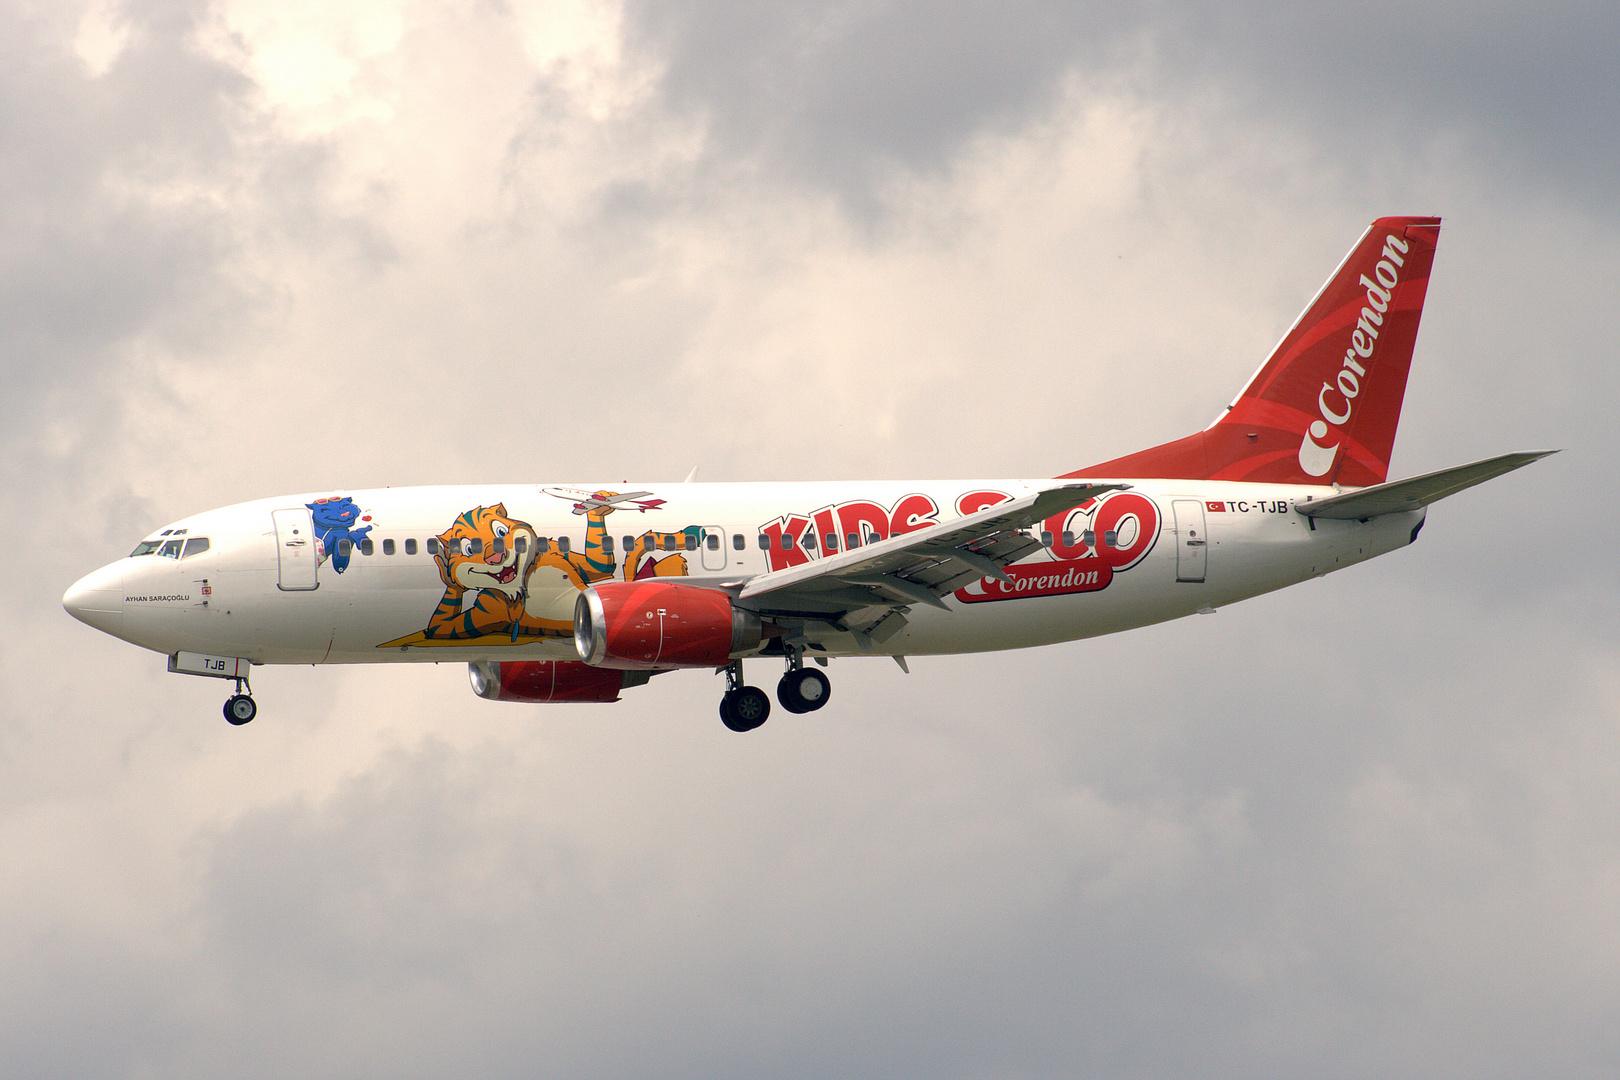 TC-TJB Corendon Airlines Boeing 737-300 Kids & Co c/s